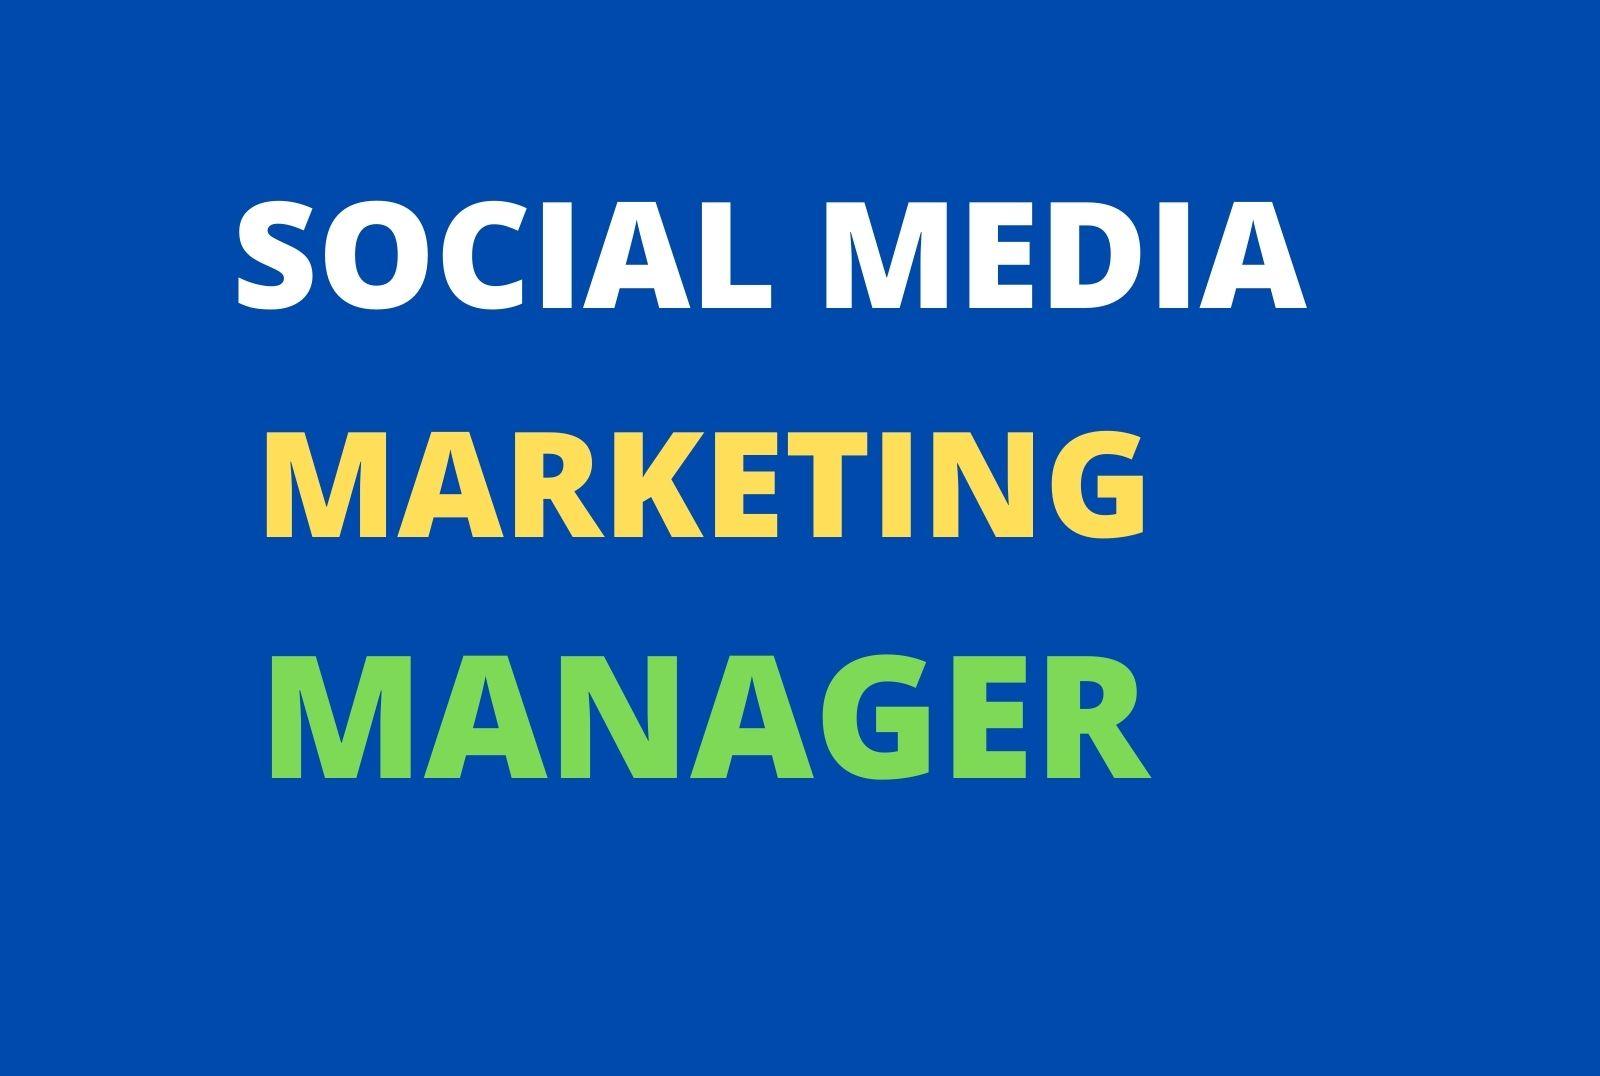 Do social media marketing and advertising